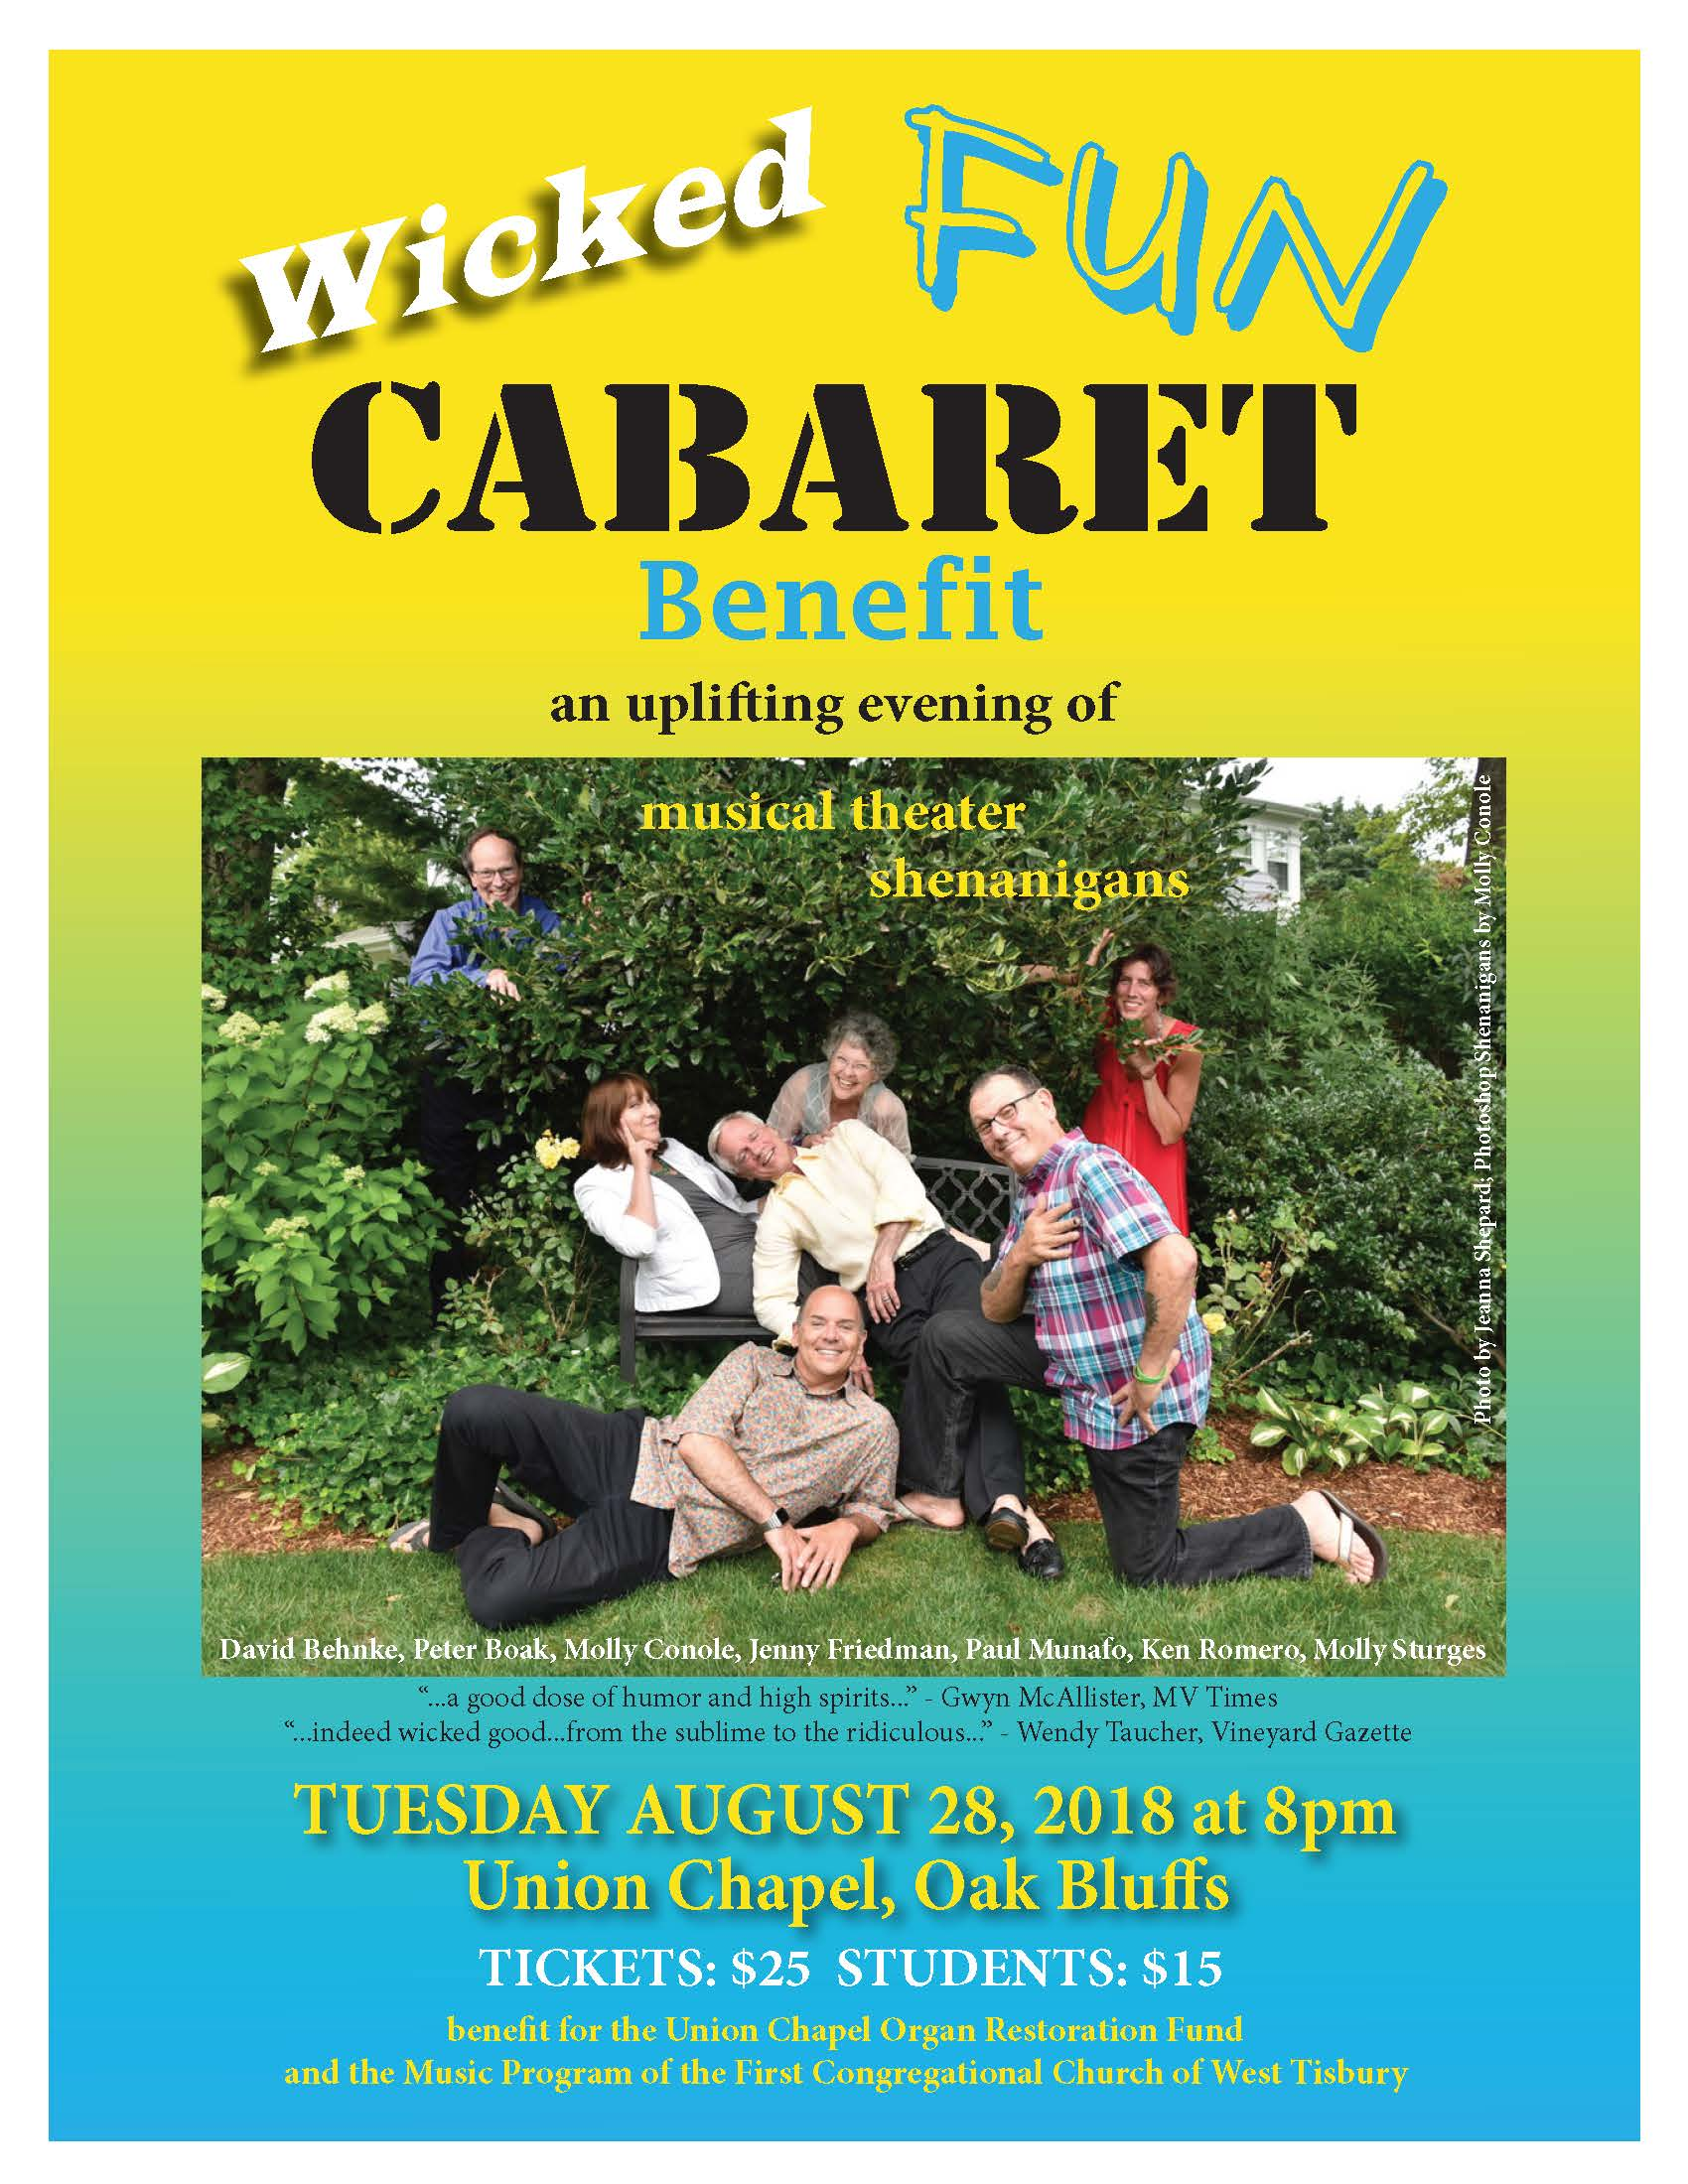 Wicked Fun Cabaret Benefit_poster_8.5x11_final (2).jpg